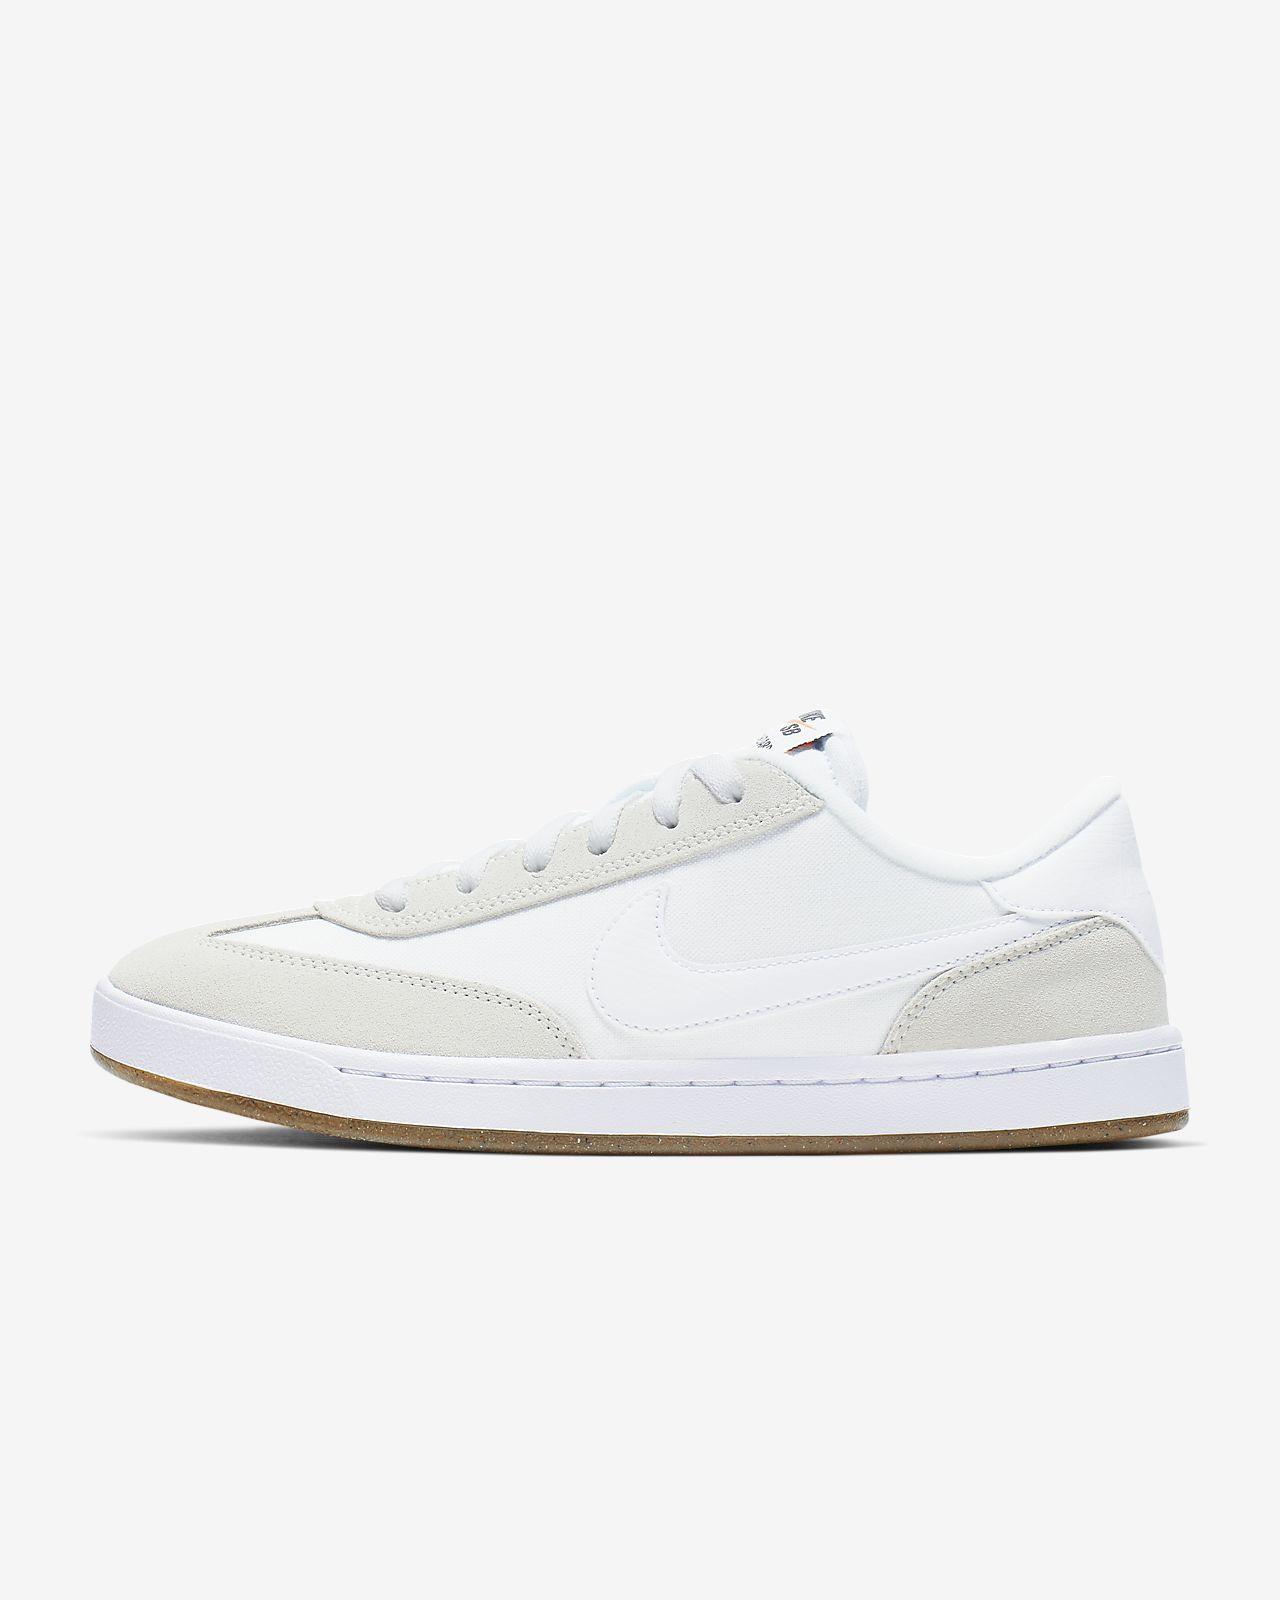 Nike SB FC Standard Skate Shoe